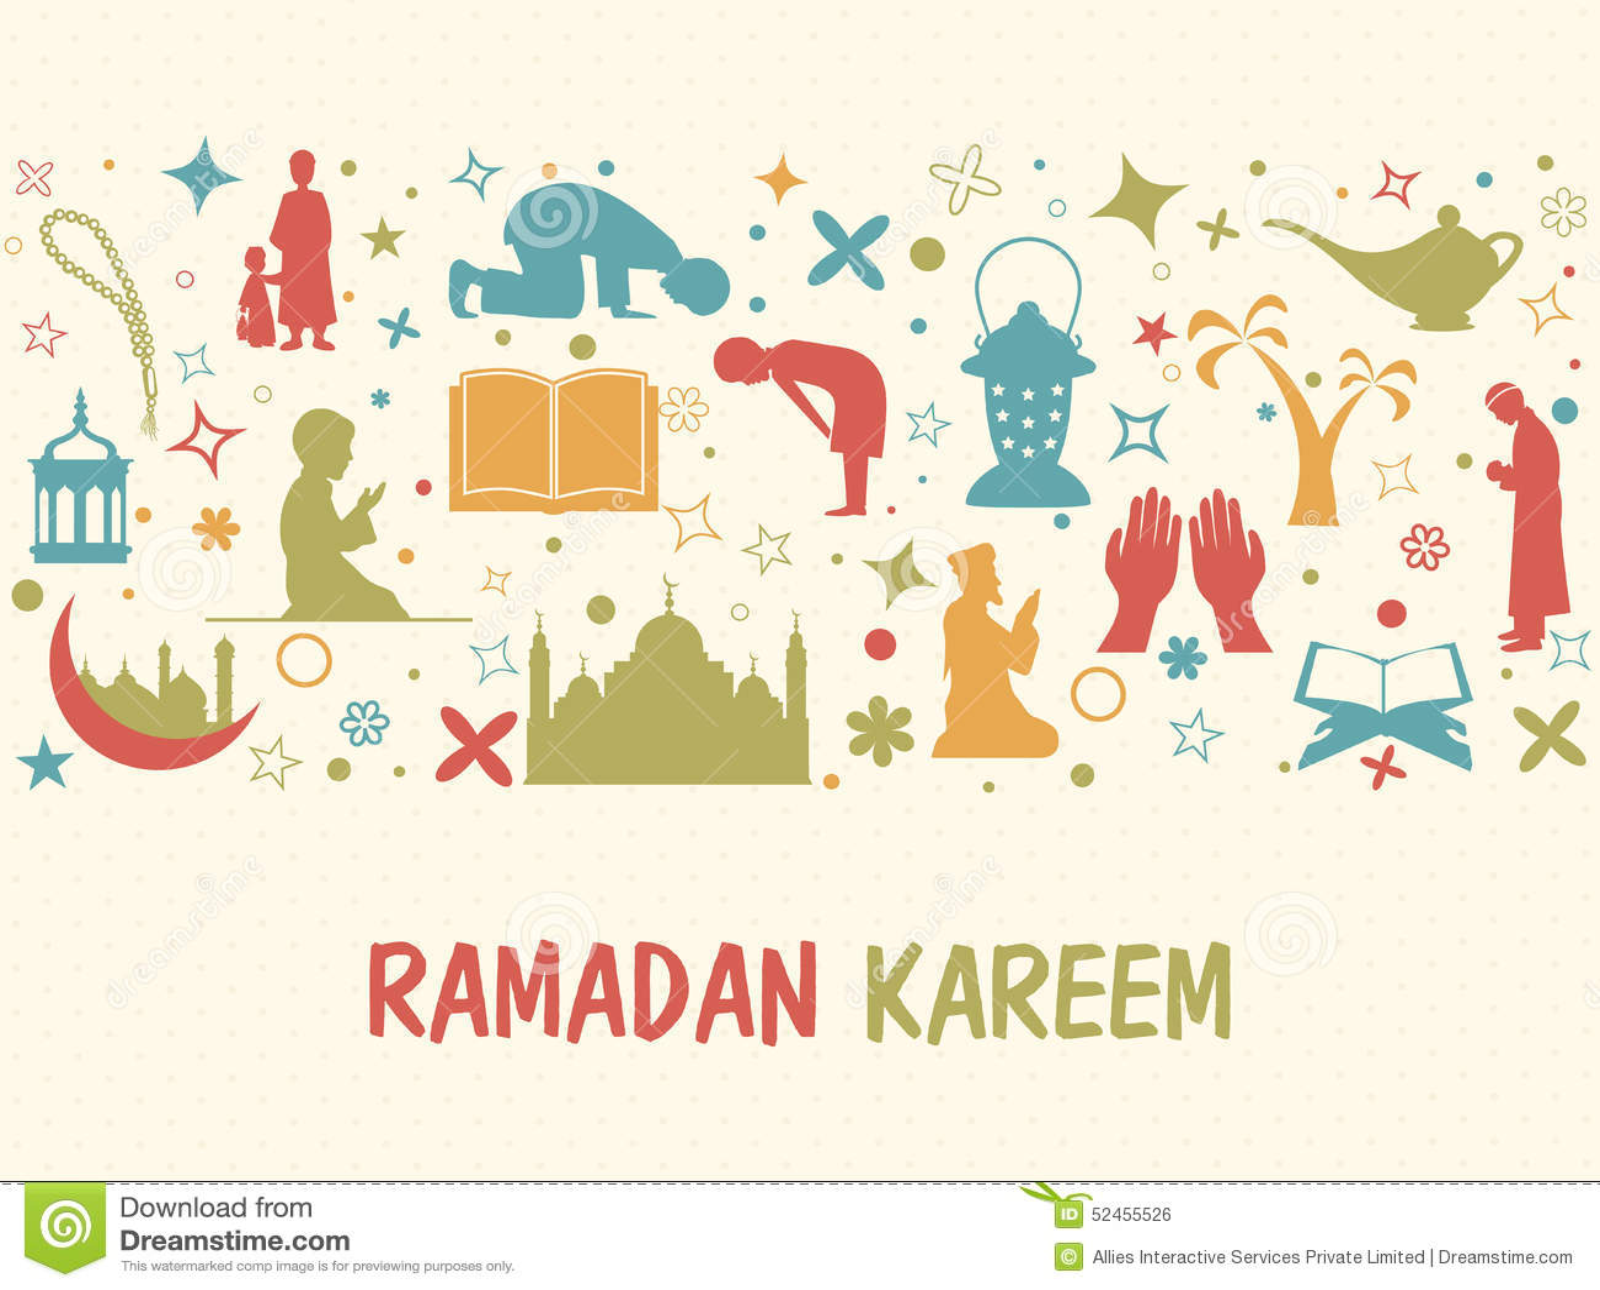 Various Islamic Elements For Ramadan Kareem Celebration. Stock ...